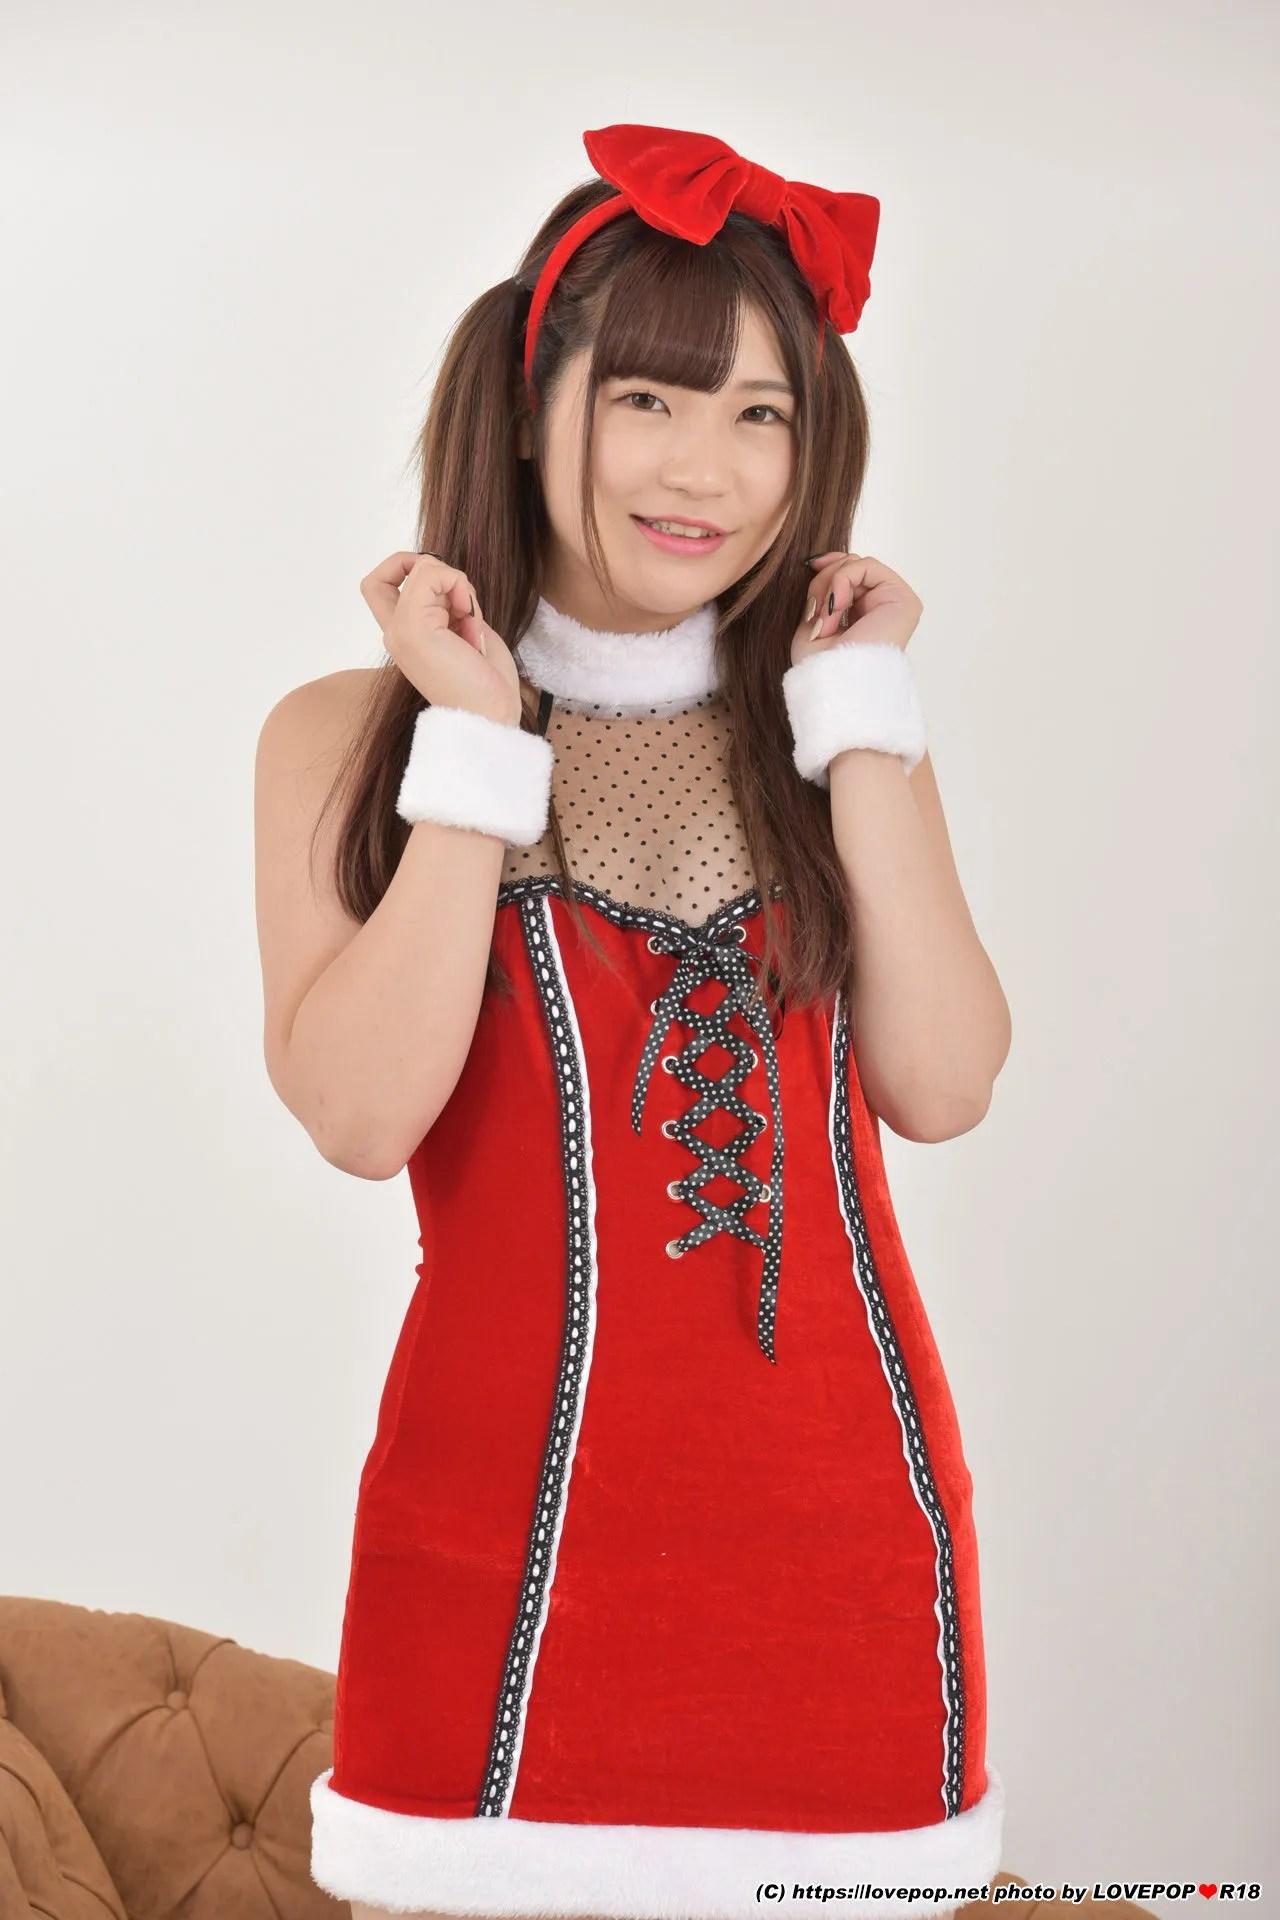 [LOVEPOP] 佐伯じゅりな Jurina Saeki Photoset 02[48P]插图(1)